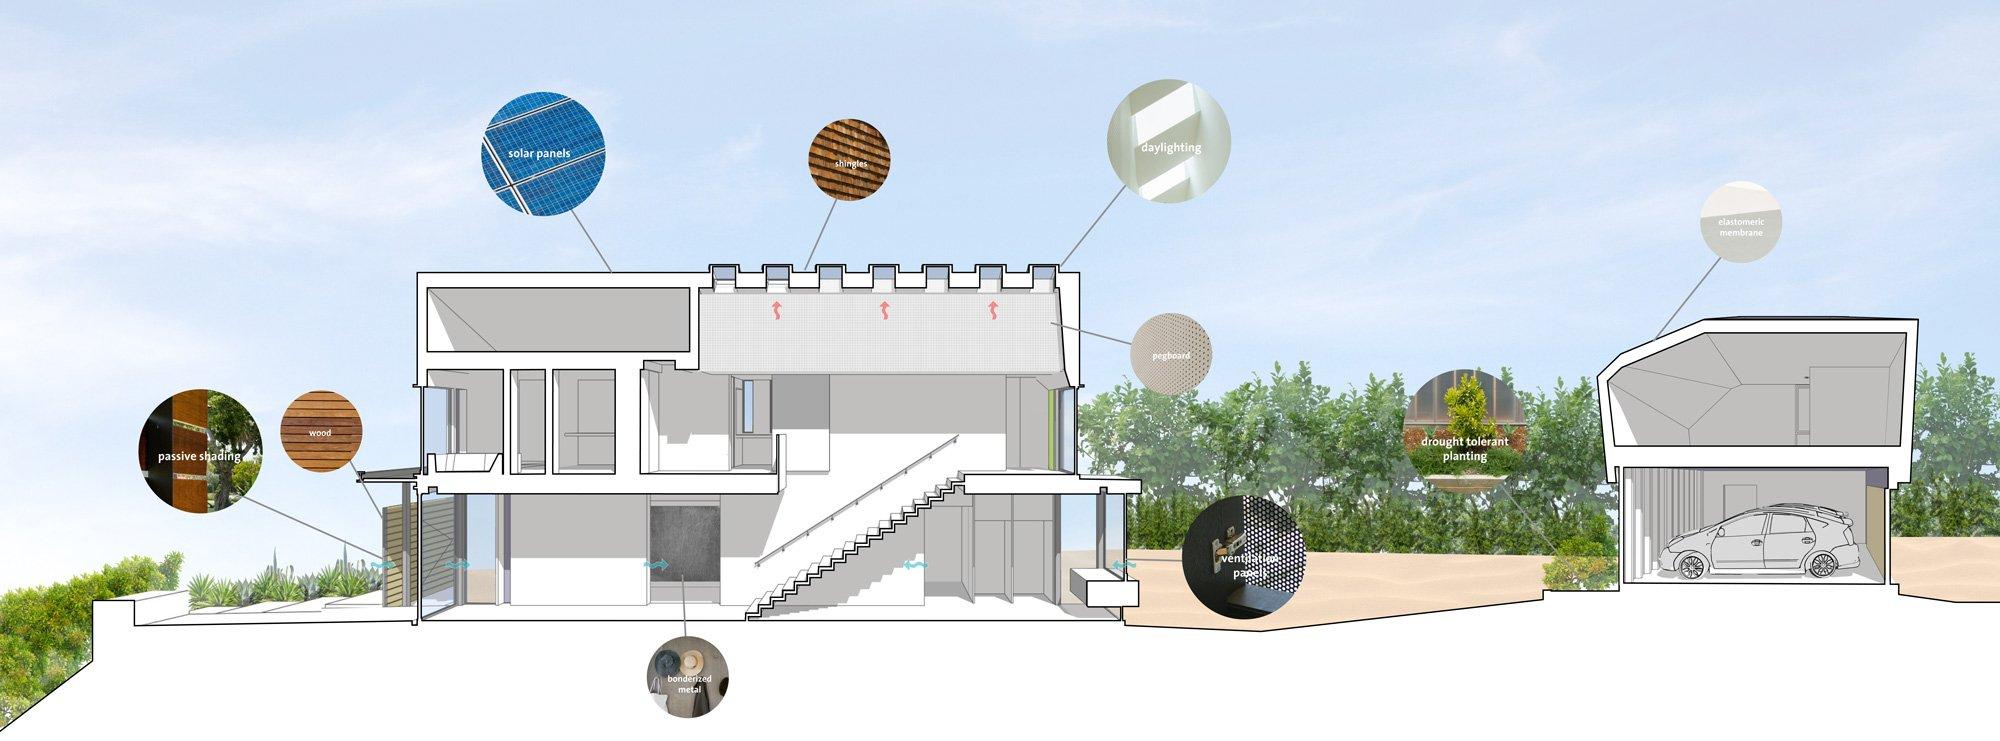 Concept © Koning Eizenberg Architecture